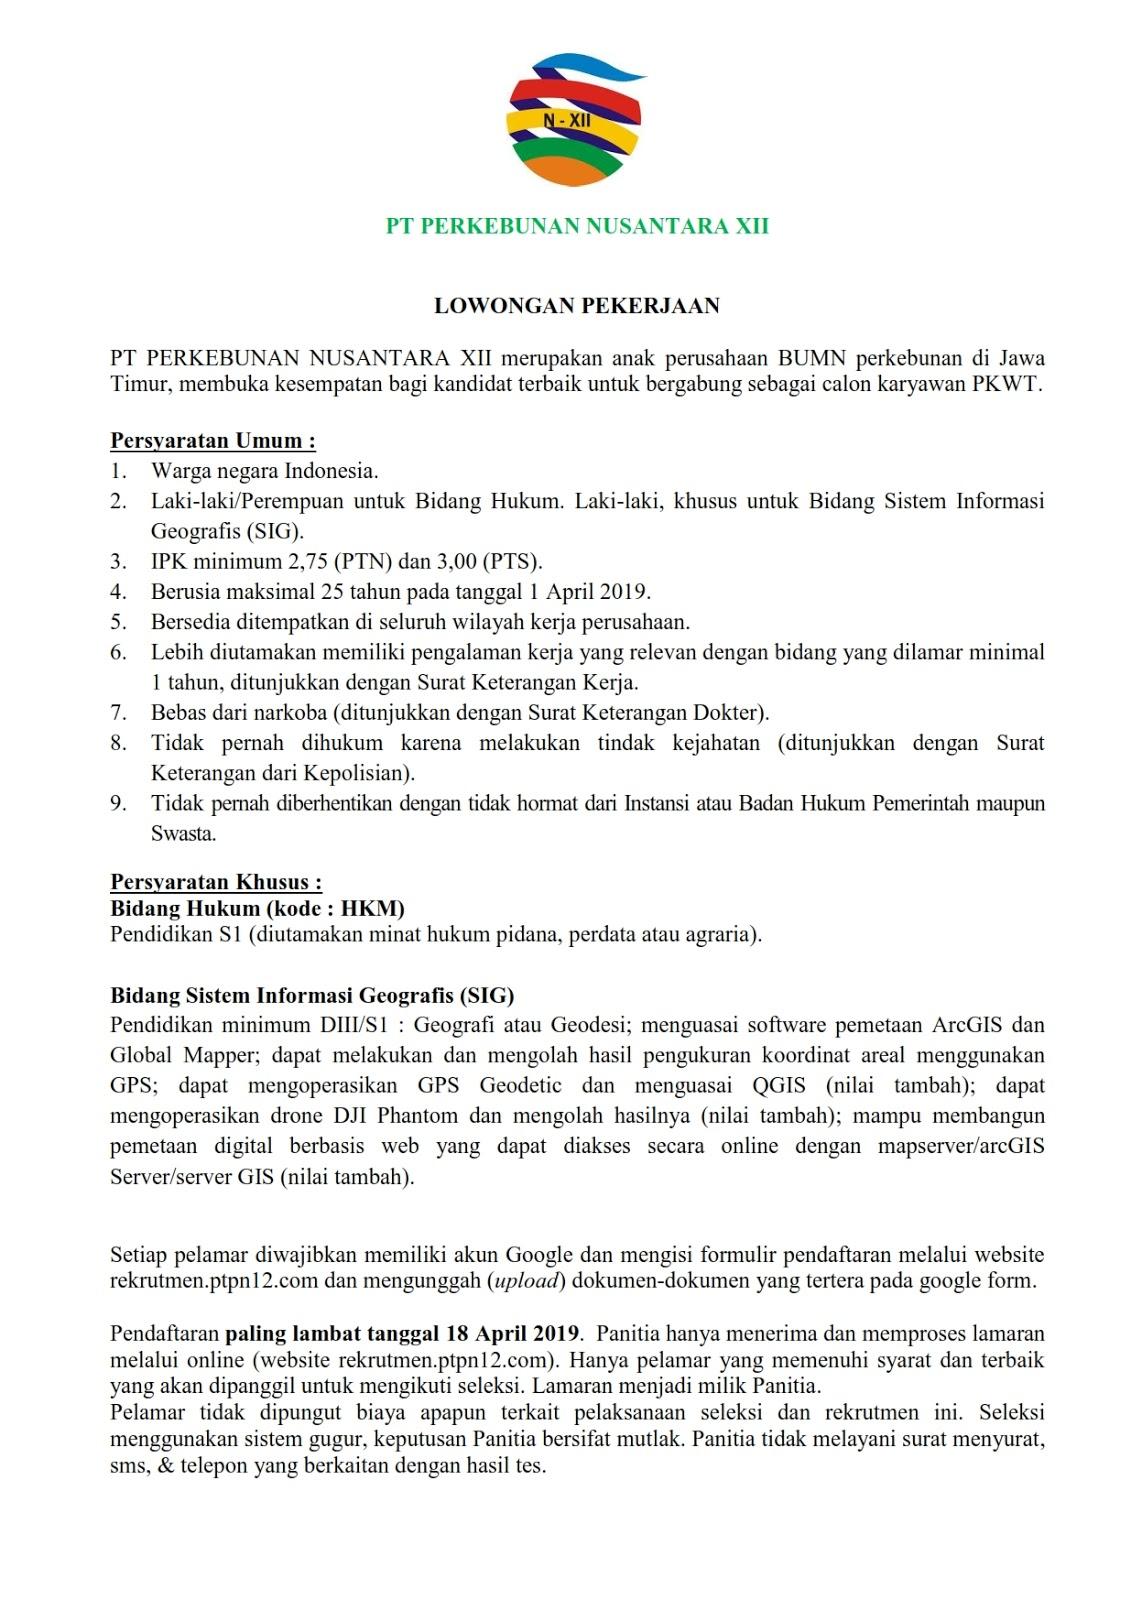 Lowongan Kerja Pt Perkebunan Nusantara Xii Rekrutmen Dan Lowongan Kerja Bulan Februari 2021